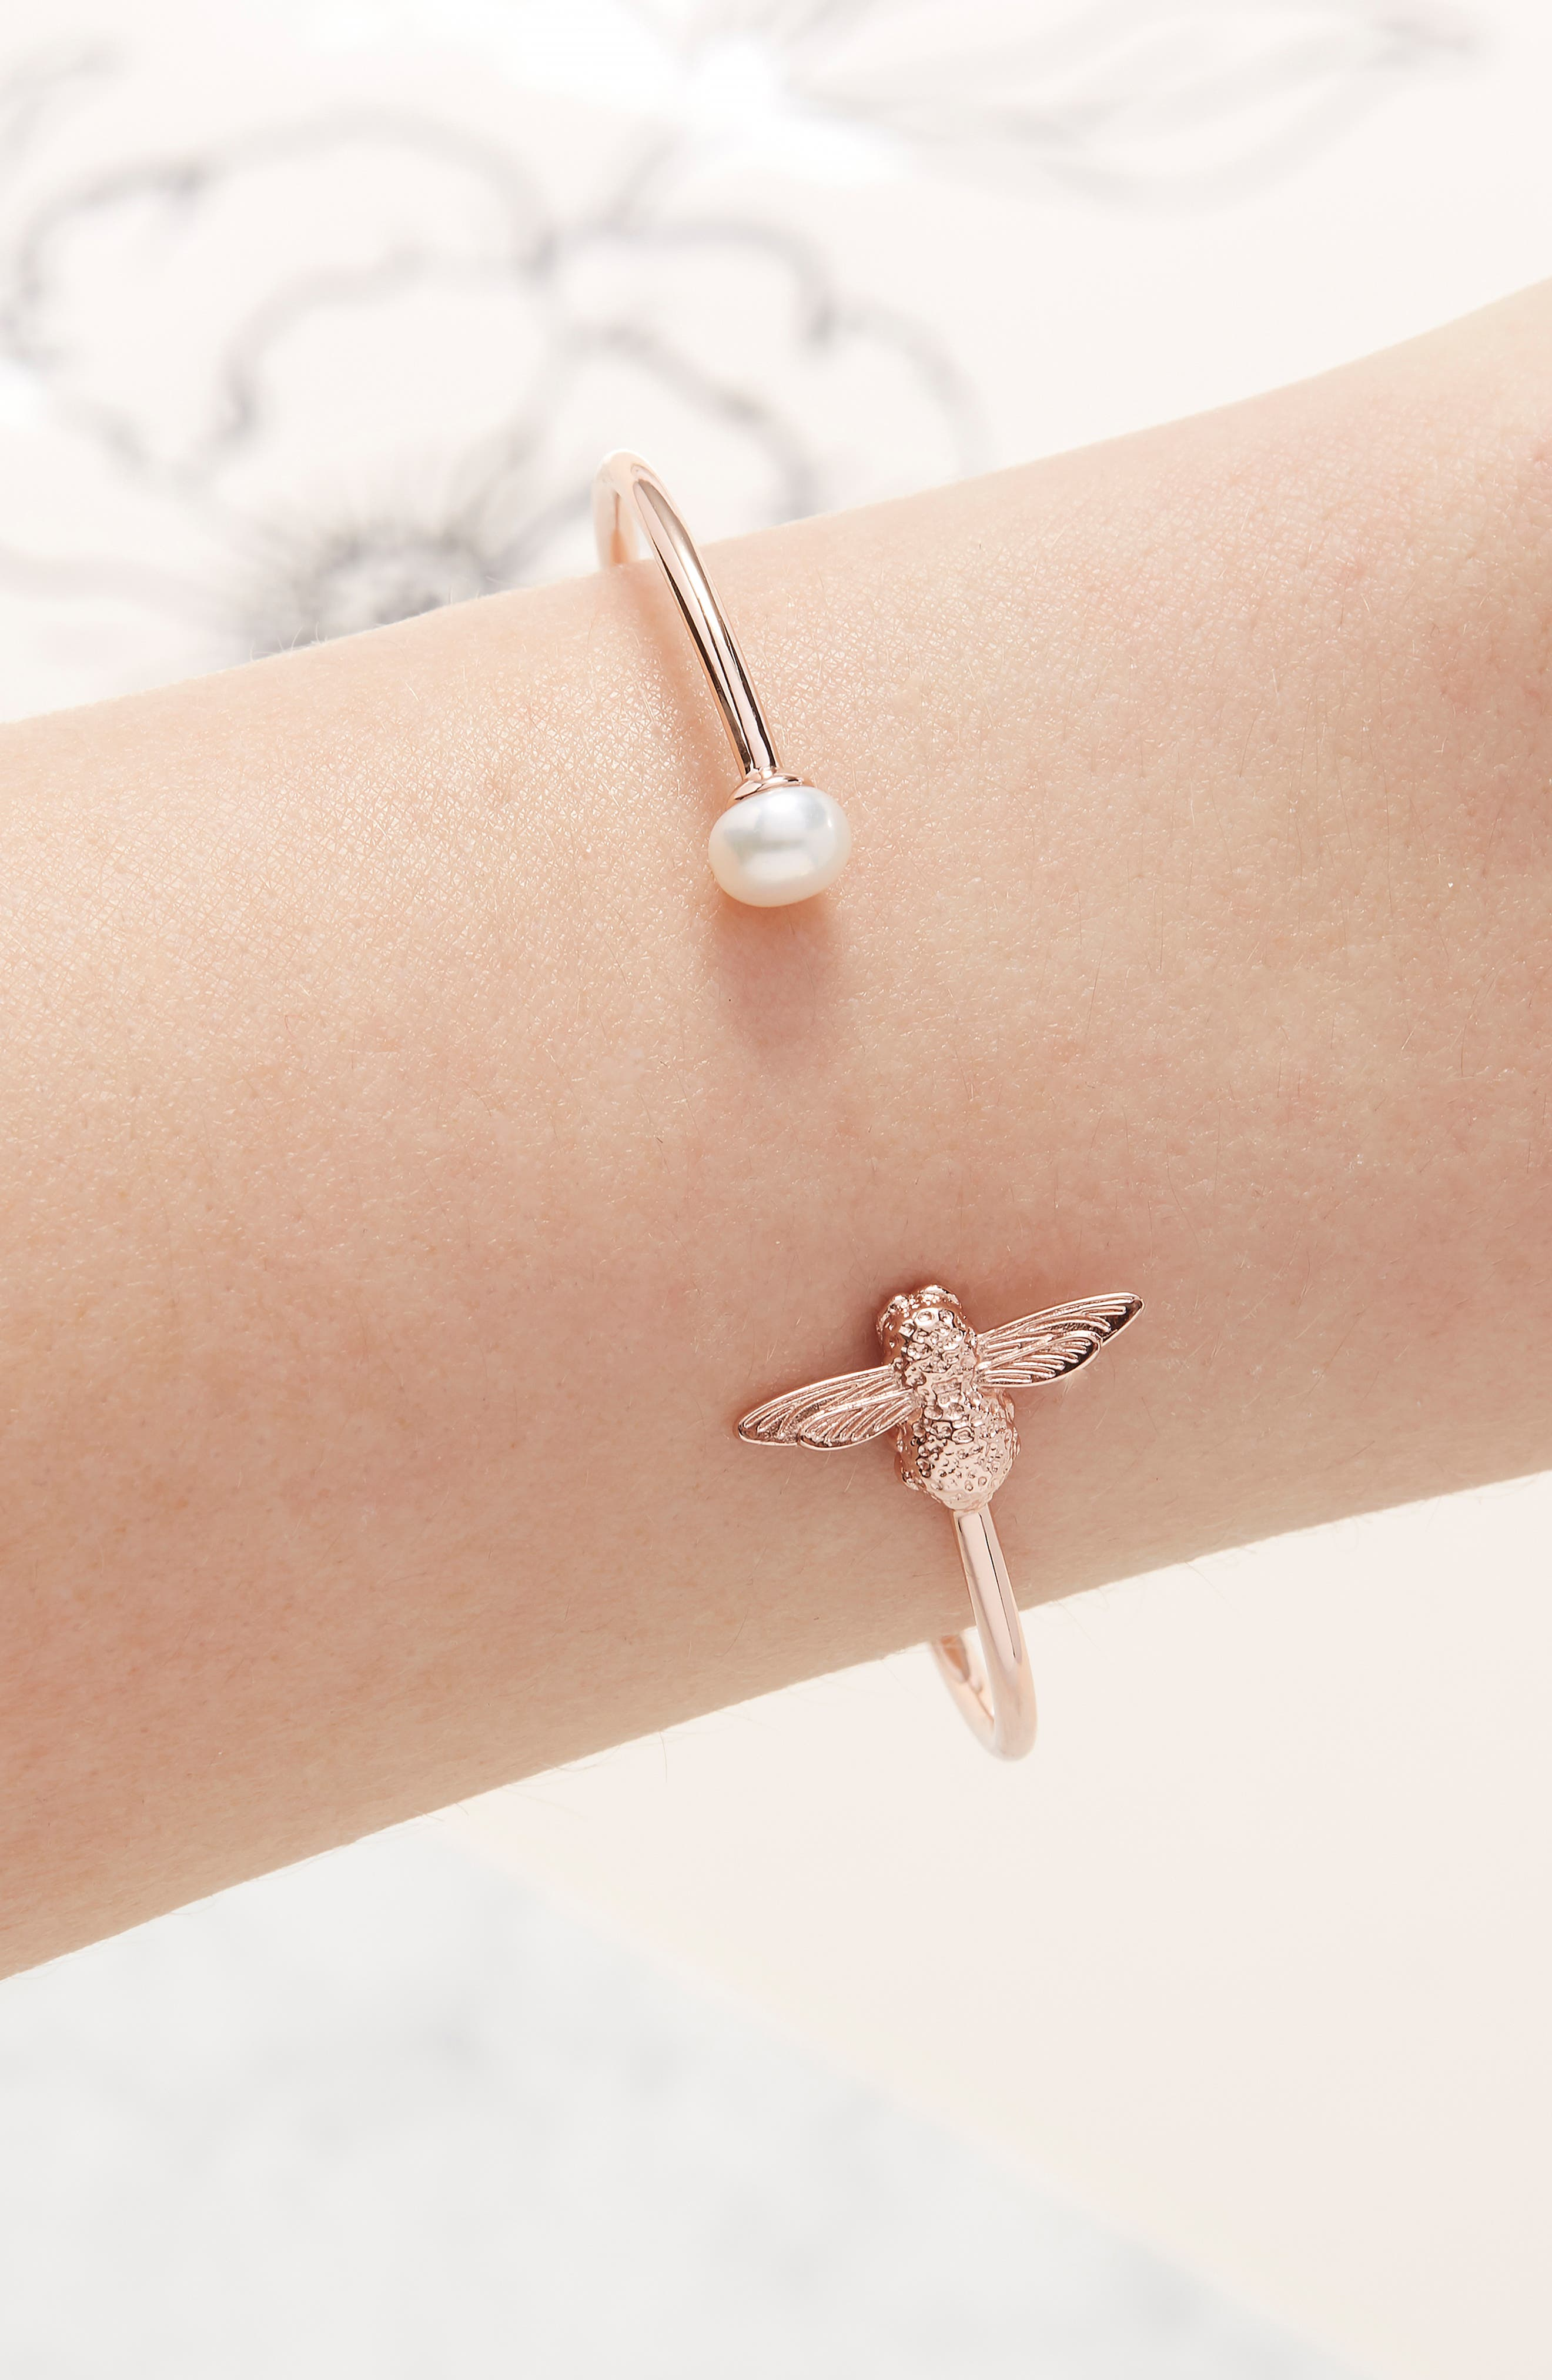 Pearl Bee Bangle Bracelet,                             Alternate thumbnail 2, color,                             ROSE GOLD